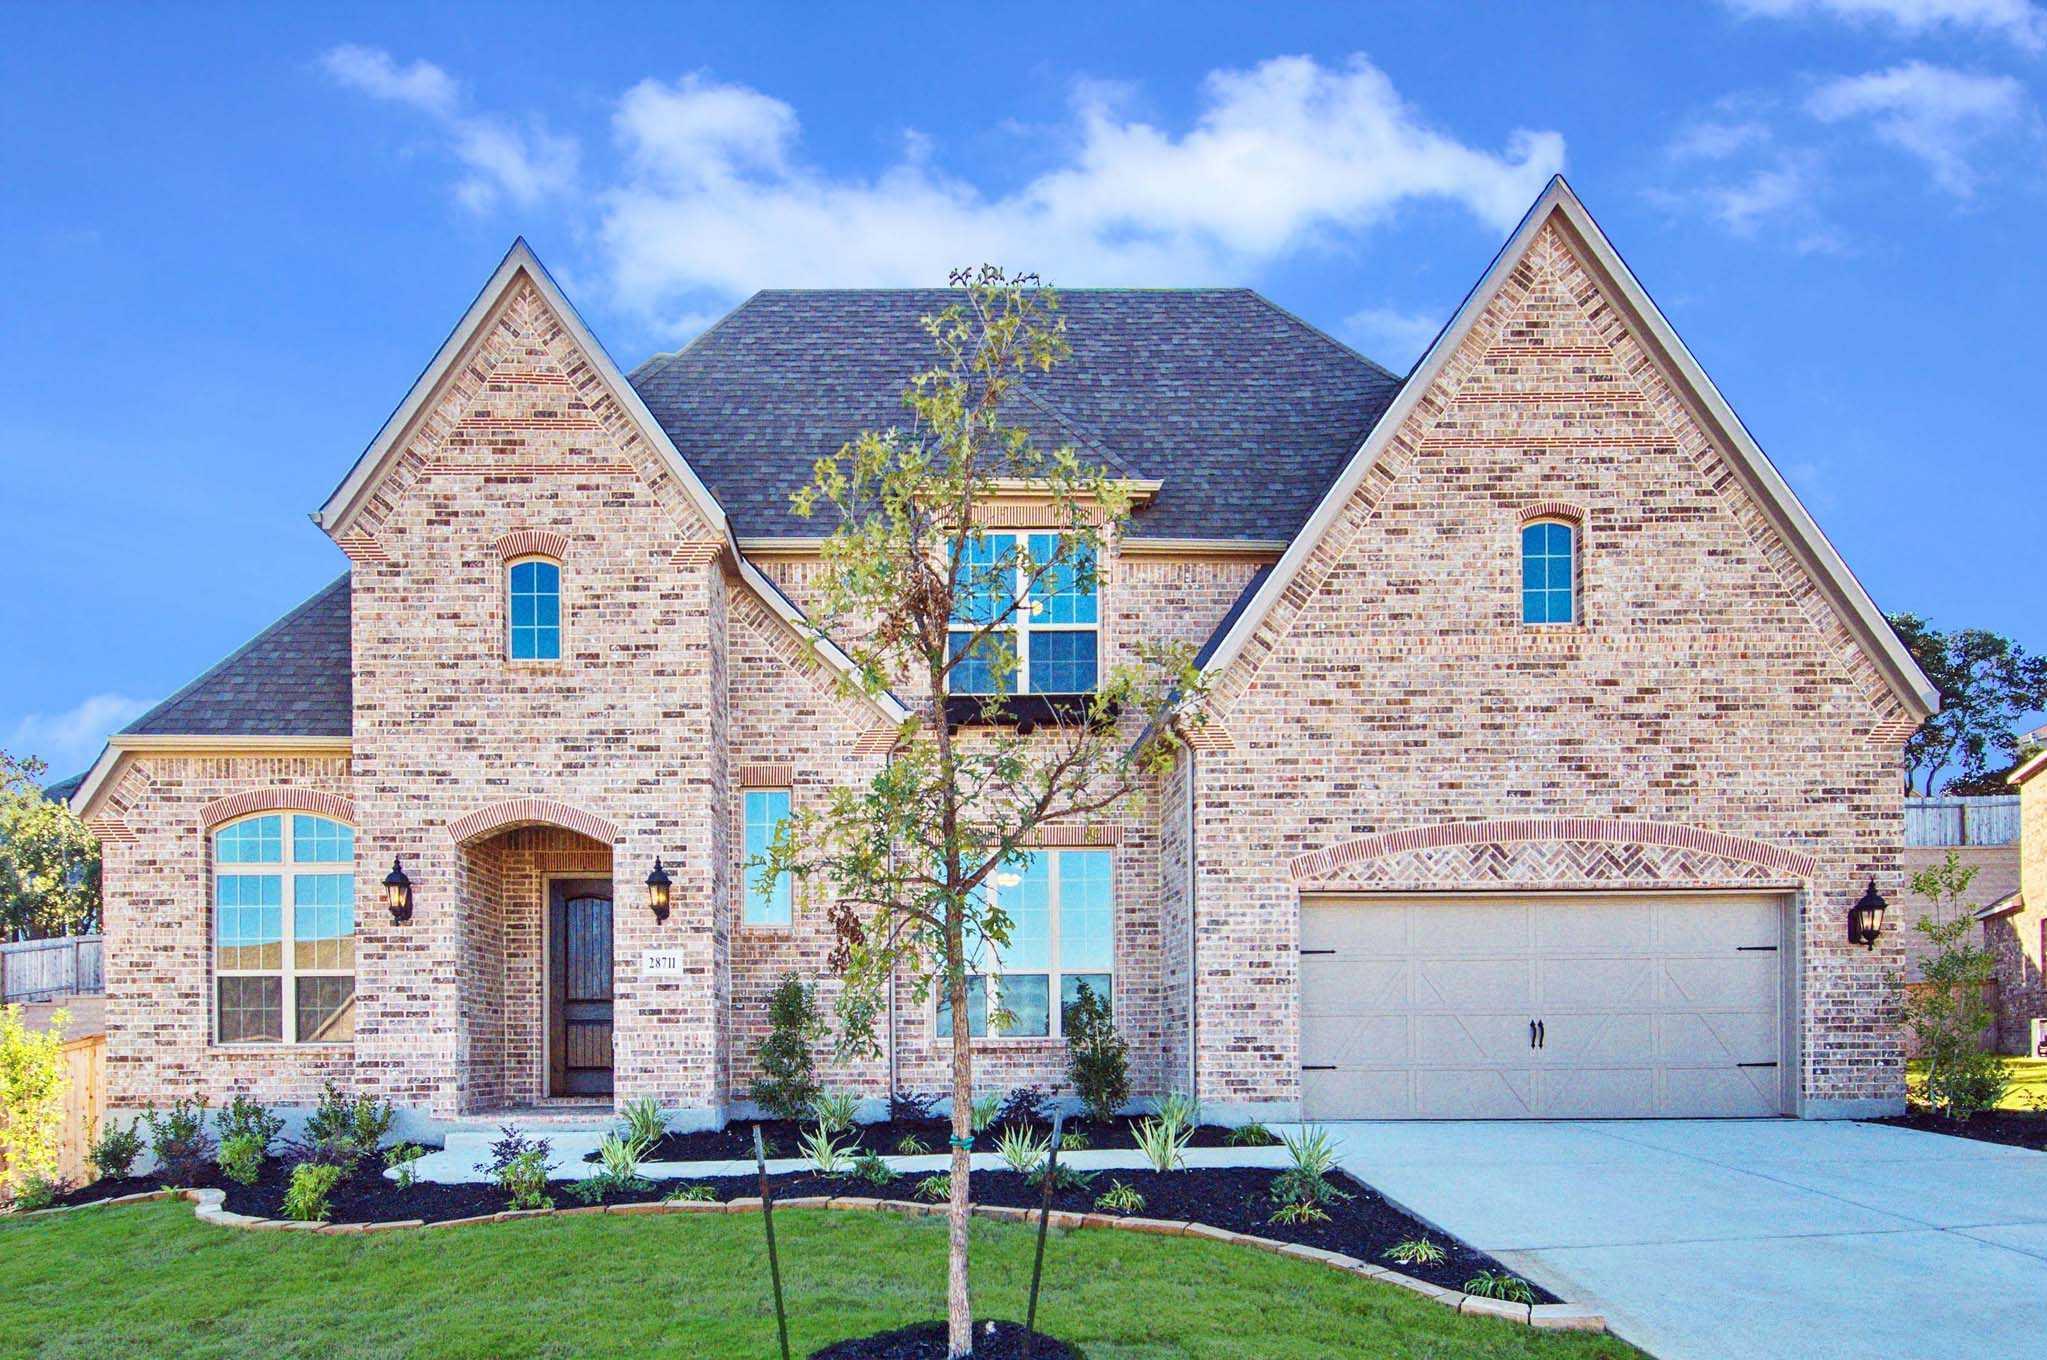 Single Family for Sale at Plan 293 28711 Hidden Gate Fair Oaks Ranch, Texas 78015 United States